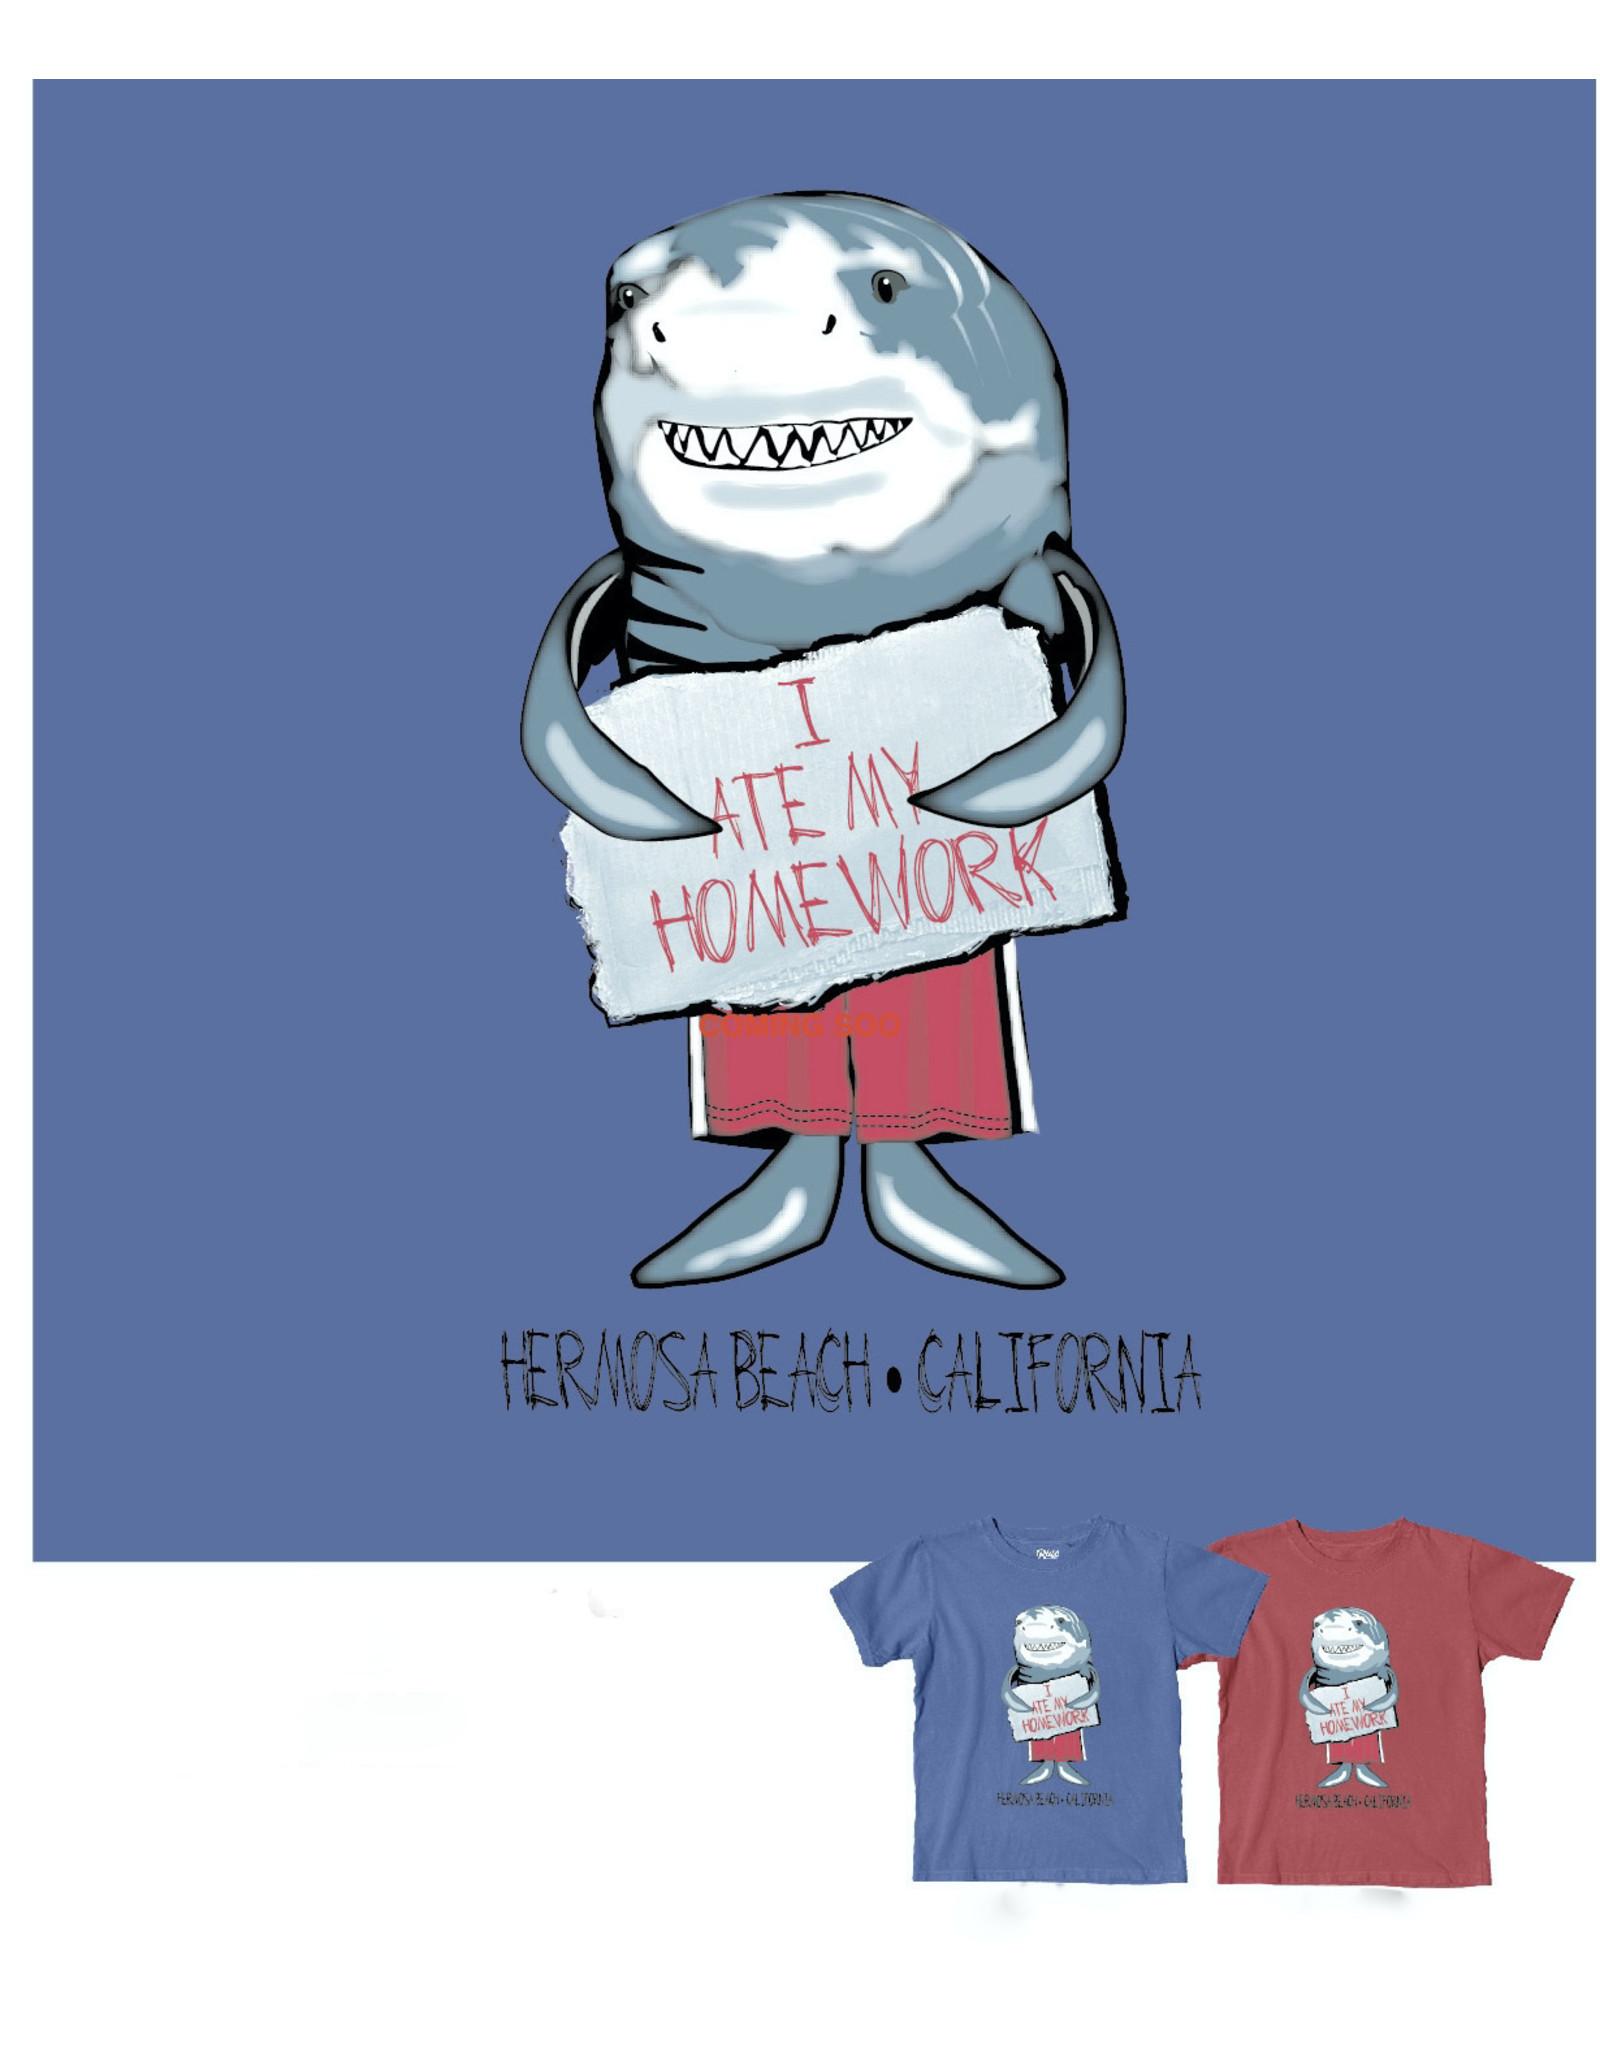 Blue 84 #50.1Y B84 DR YOUTH SS HB SMALL SPRITE SHARK PAPAYA